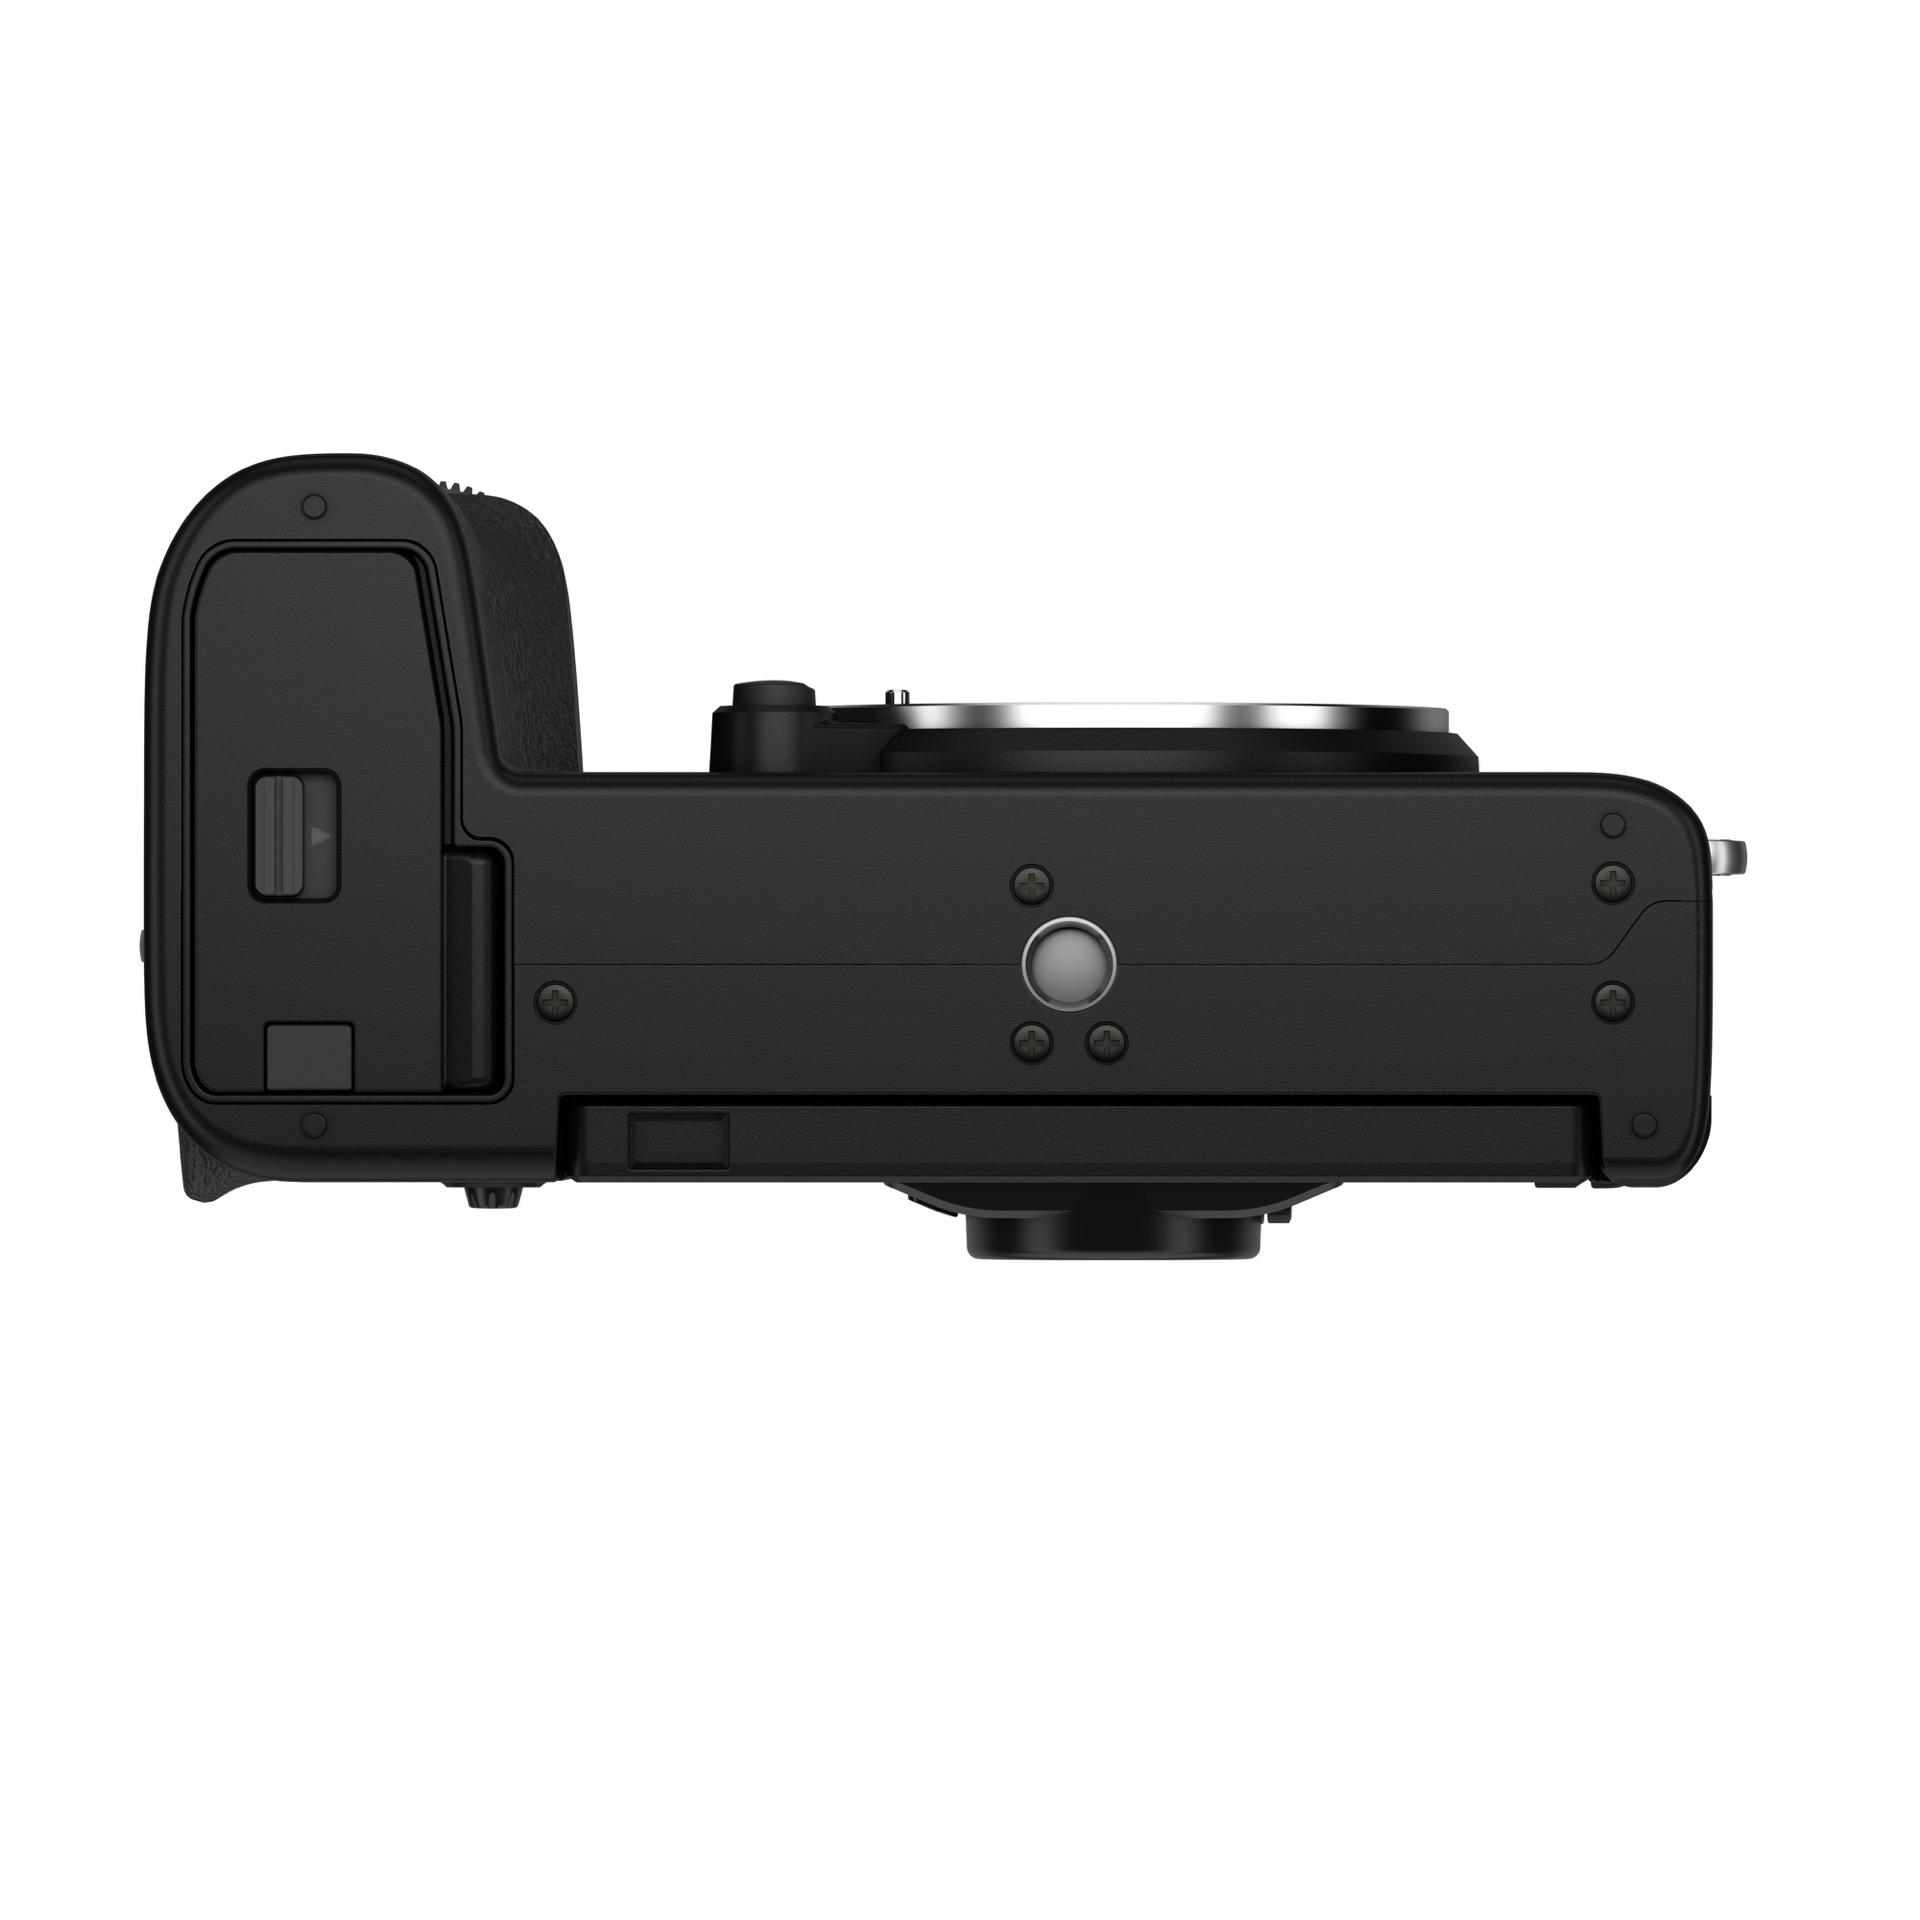 X S10 bottom   Newsshooter